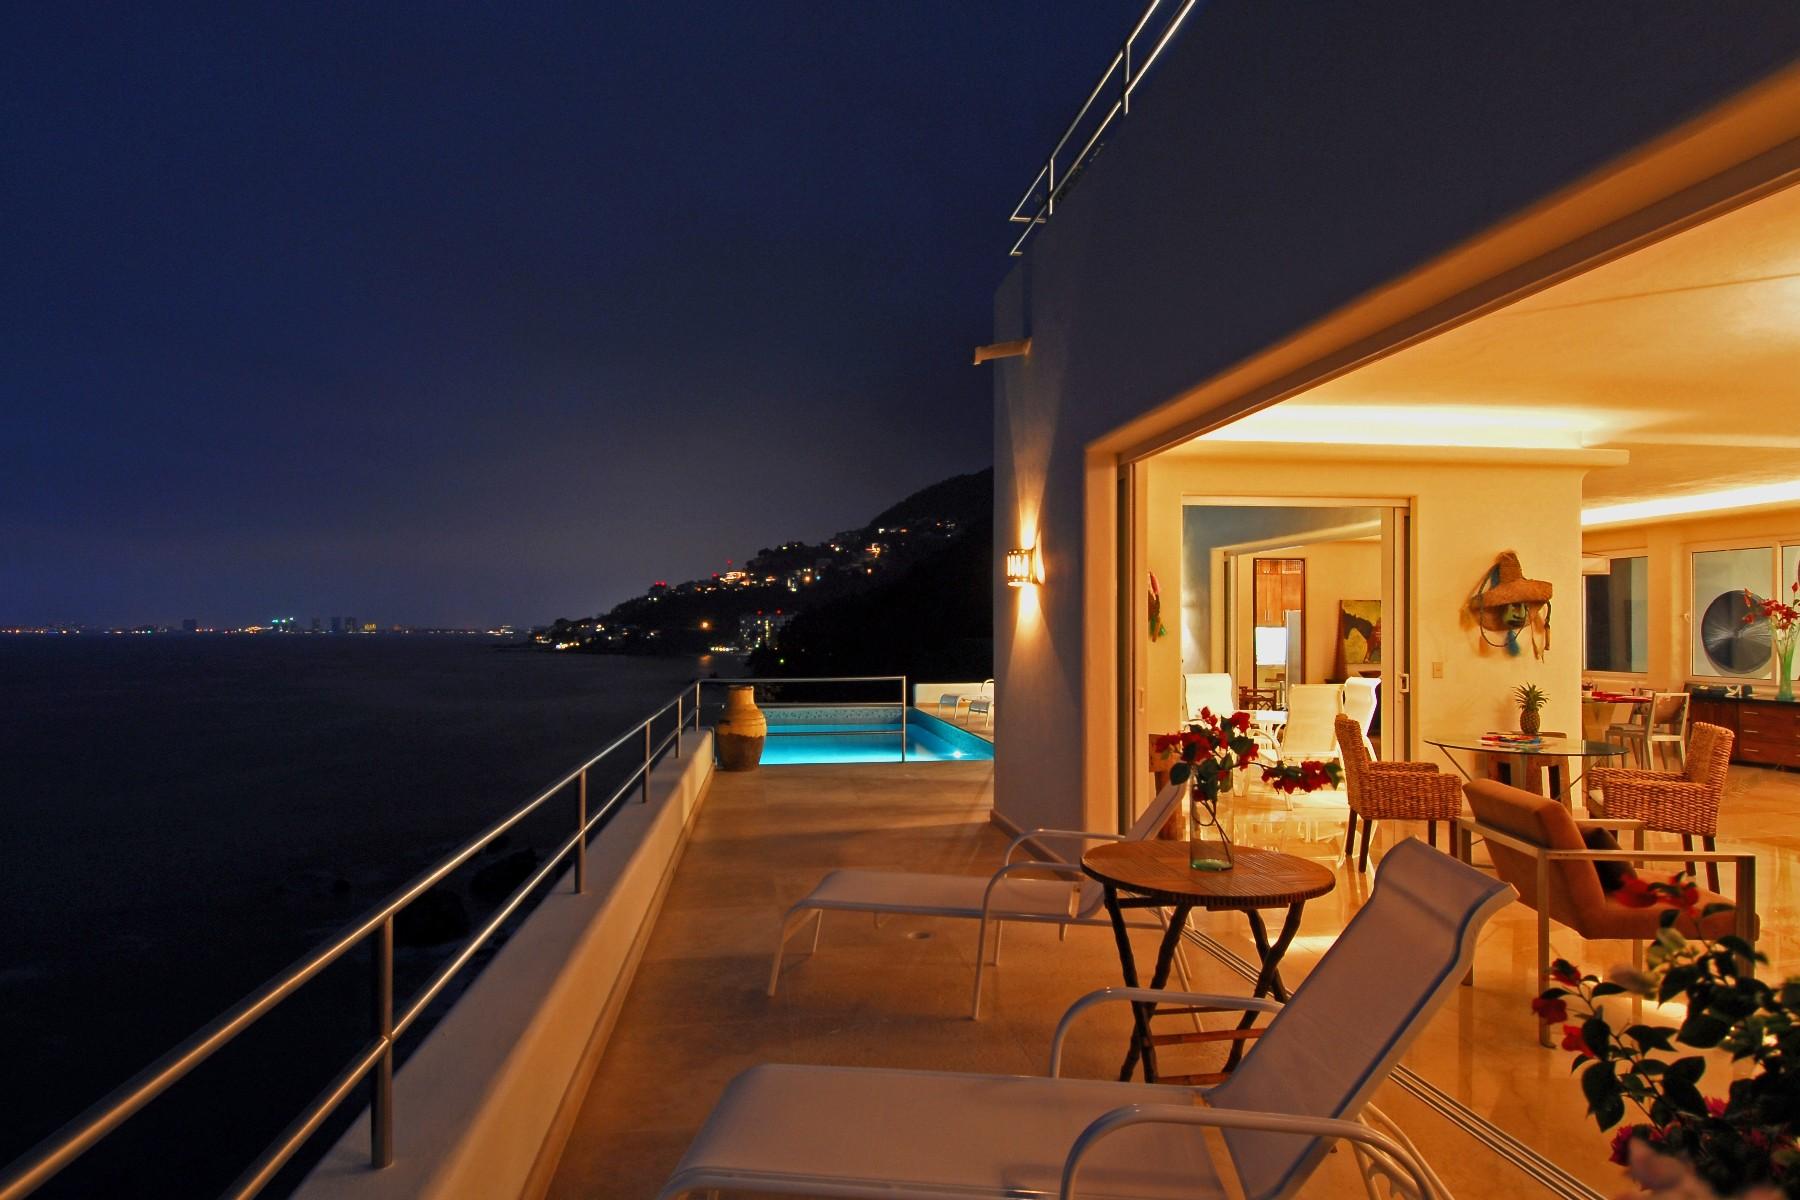 Additional photo for property listing at Villa en Playa Venados, Puerto Vallarta  Puerto Vallarta, Jalisco 48390 Mexico